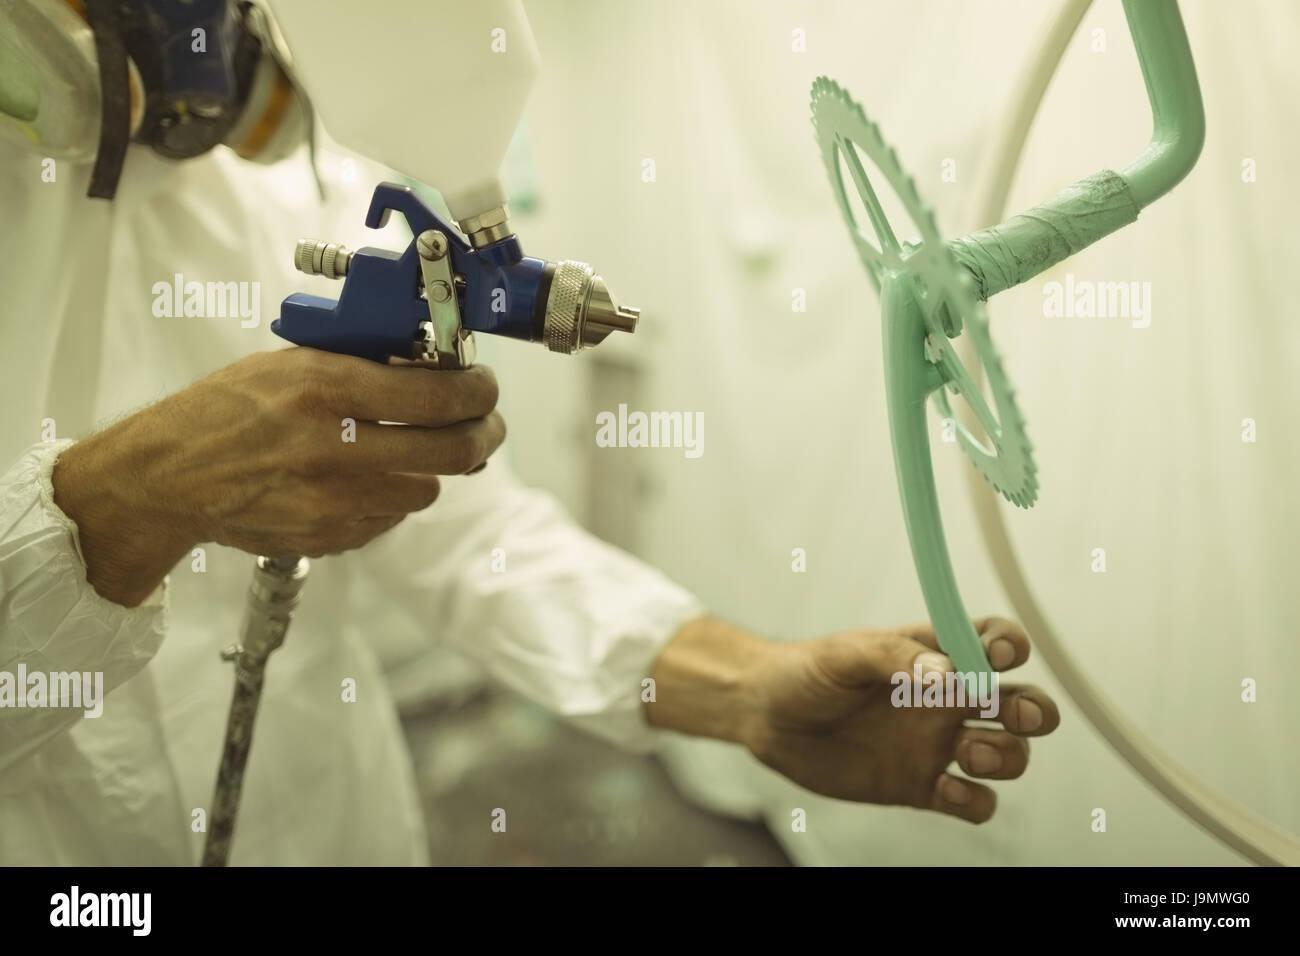 Painter painting bicycle gear through paint spray gun at workshop - Stock Image